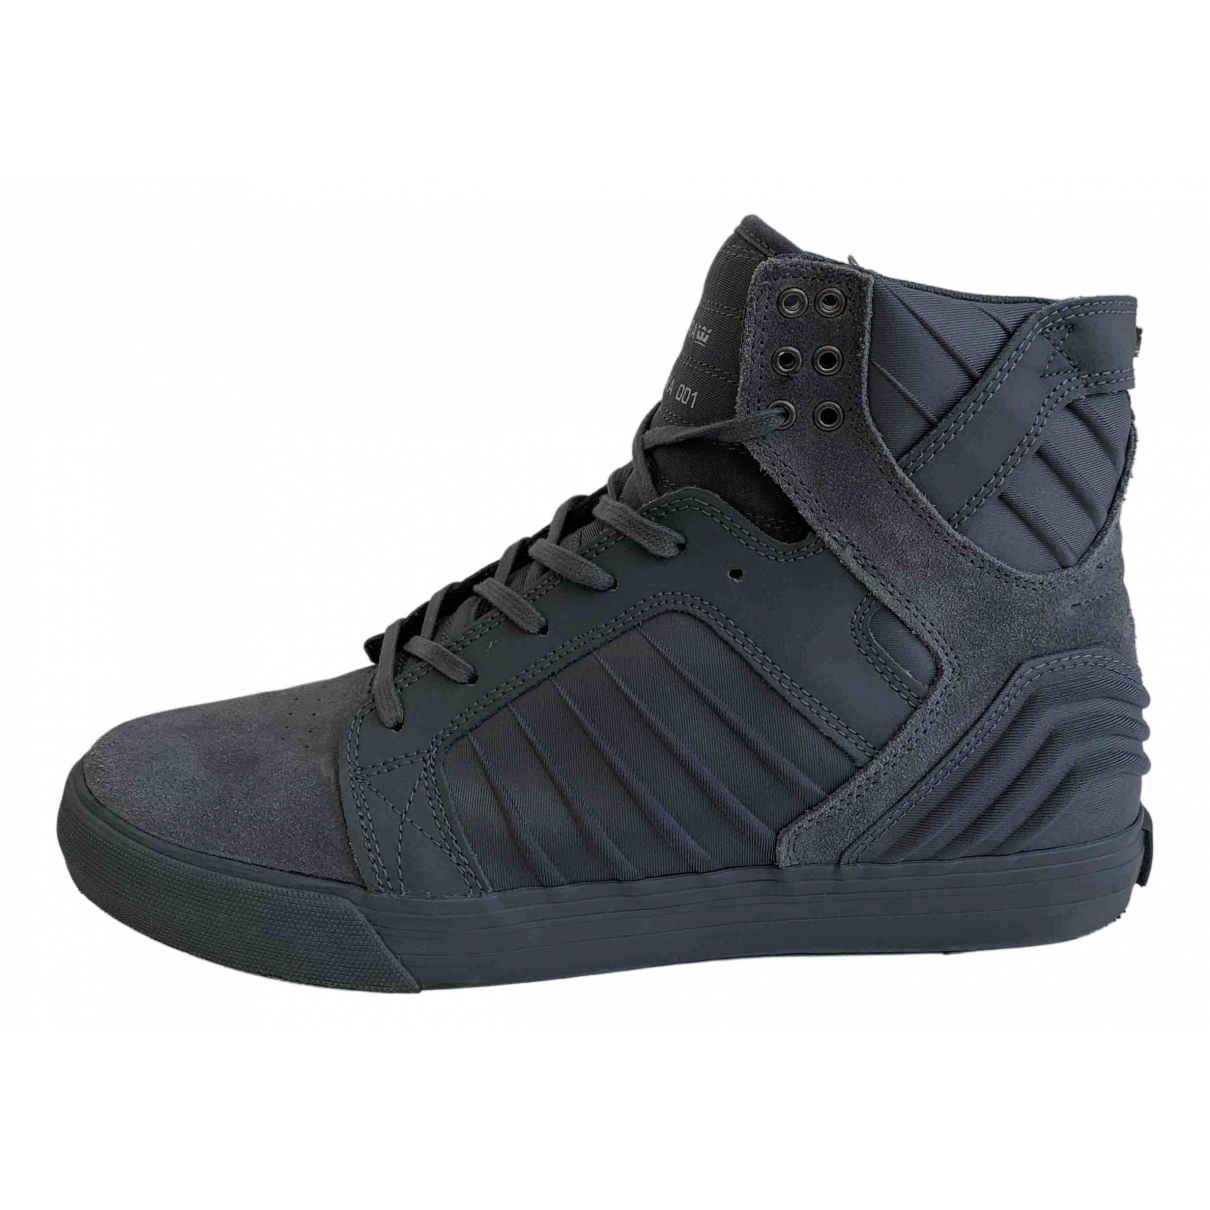 Supra - Baskets   pour homme en suede - gris